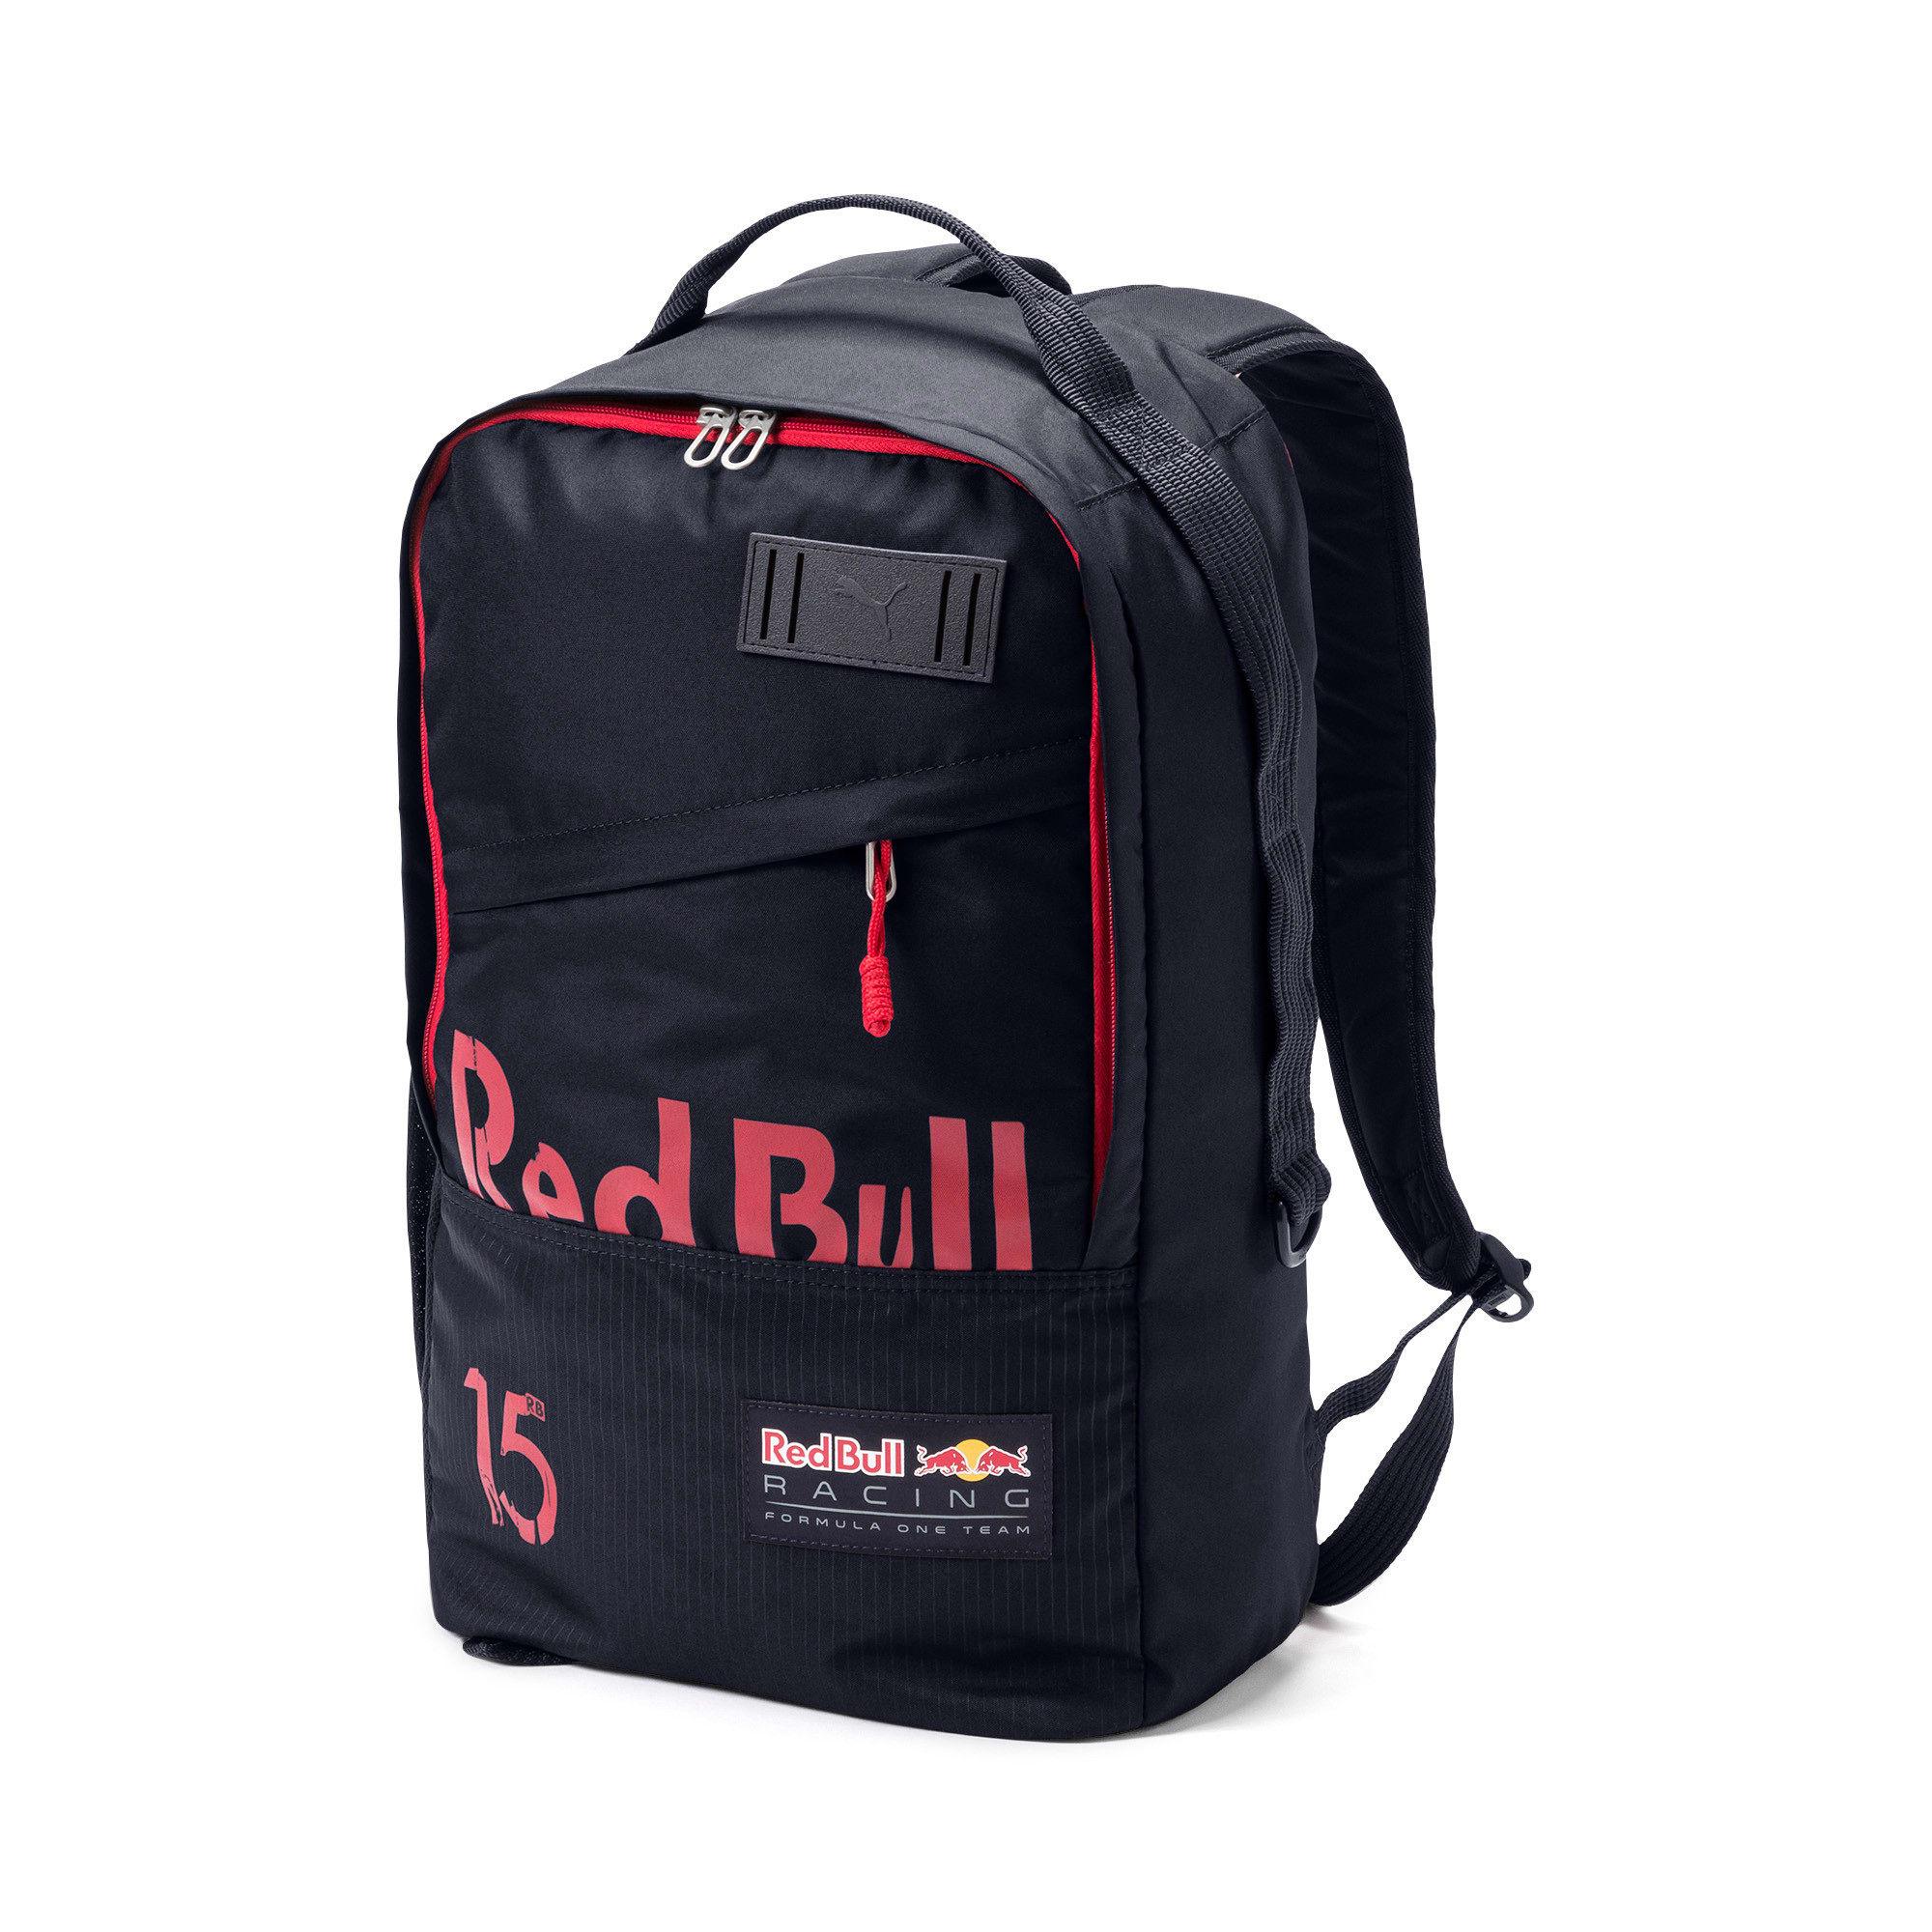 Thumbnail 1 of RED BULL RACING ライフスタイル バックパック 21L, NIGHT SKY, medium-JPN